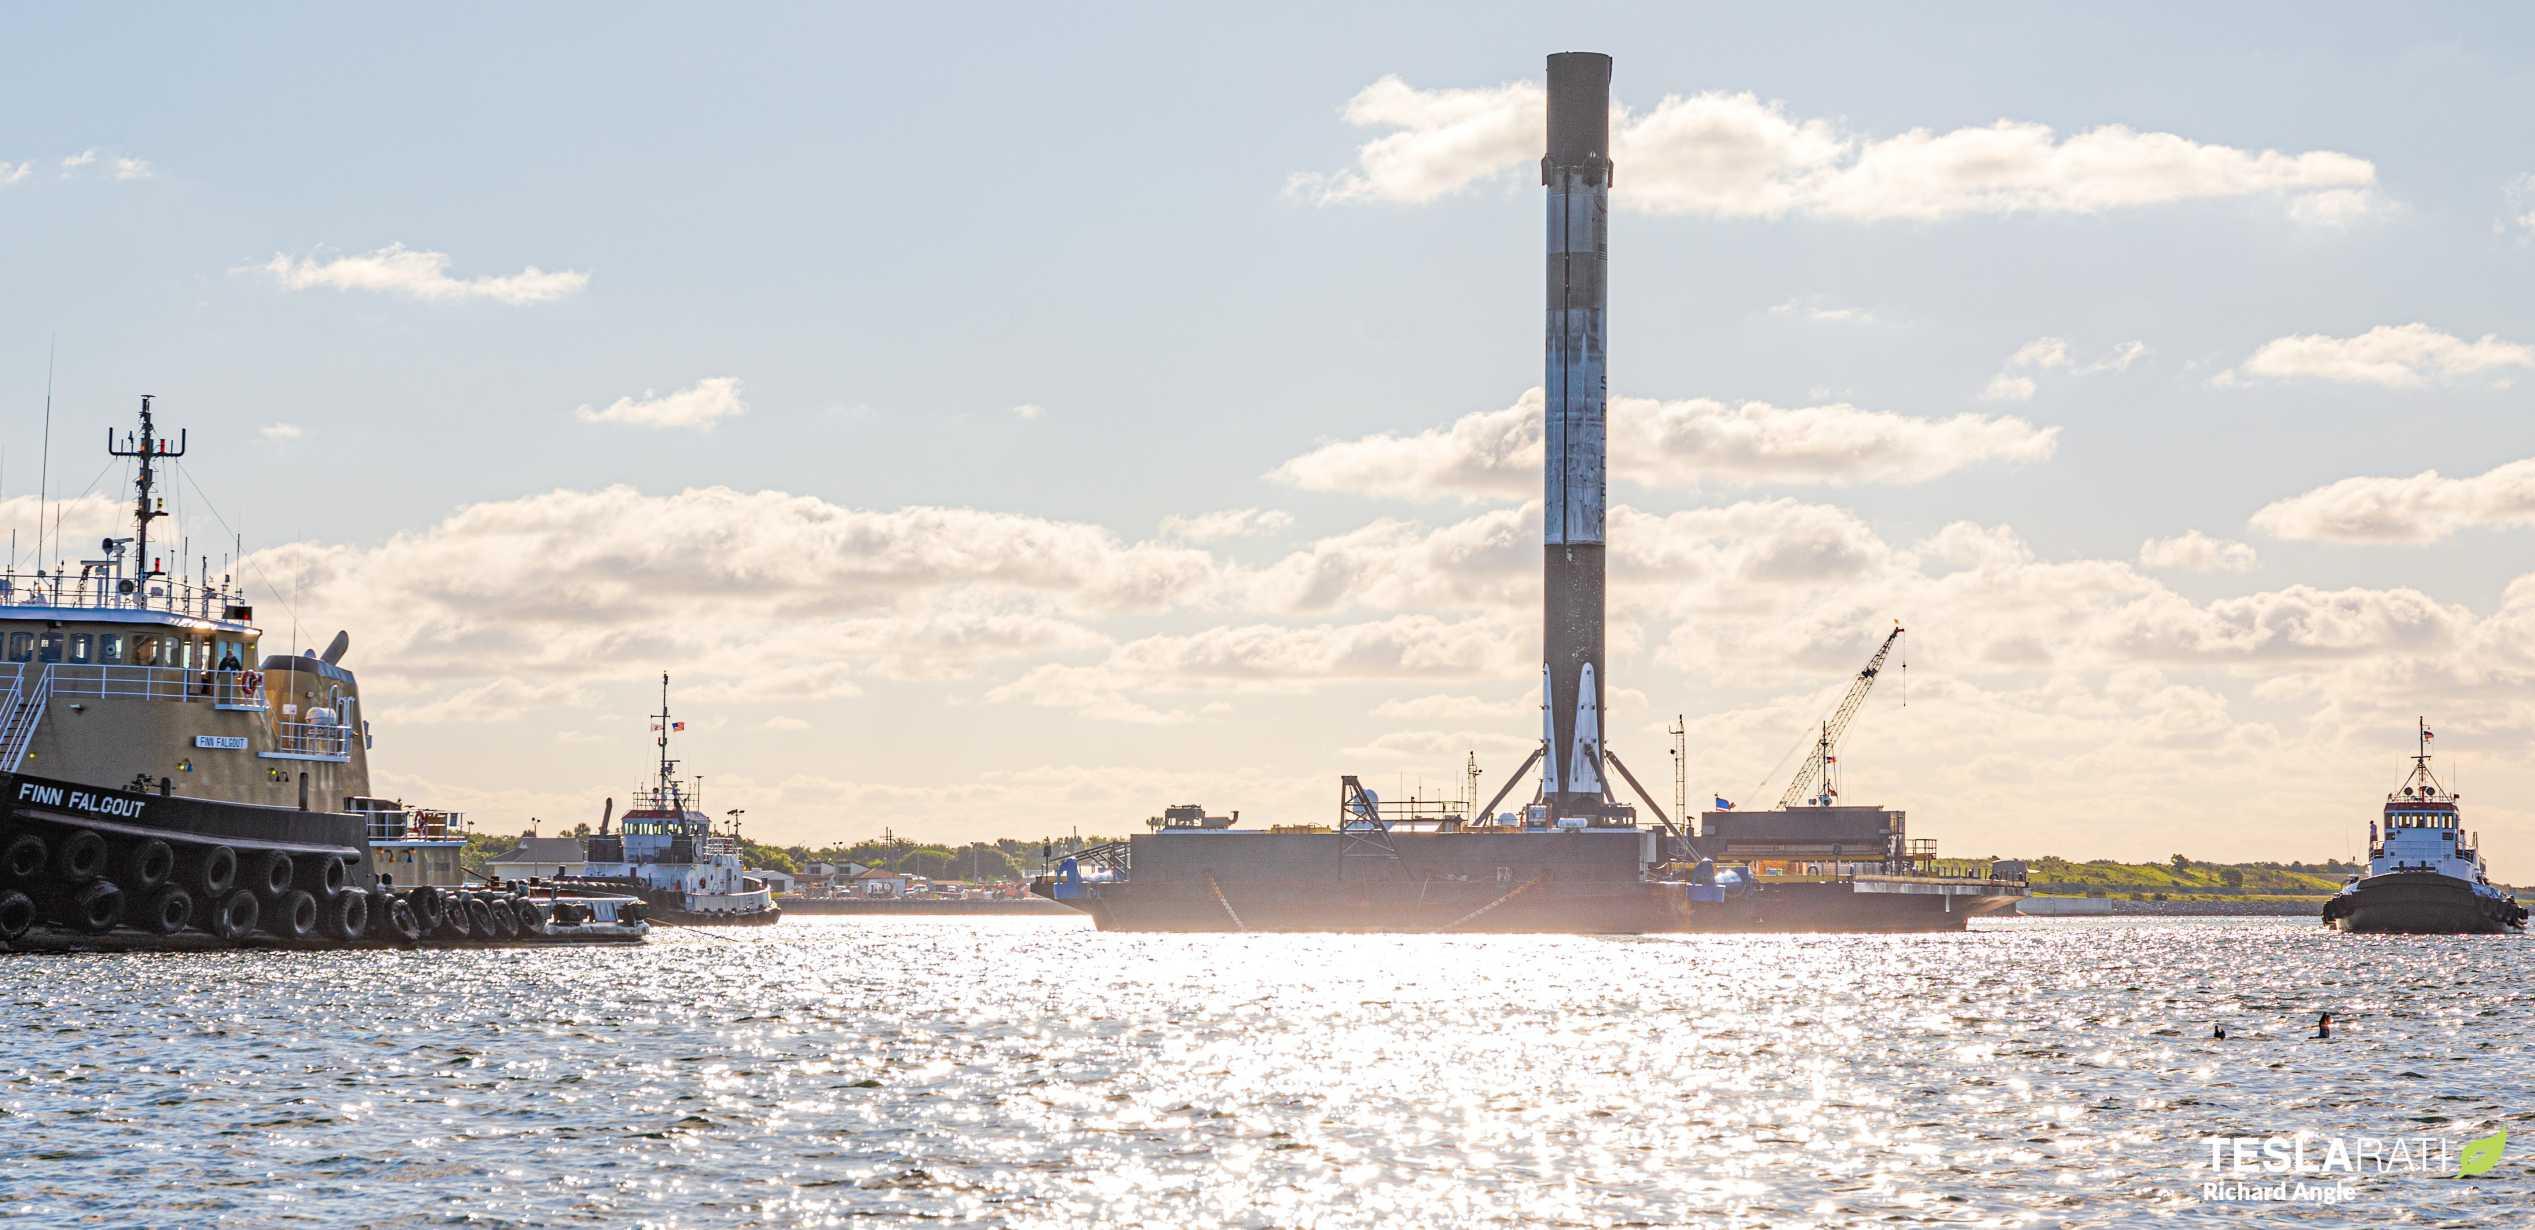 Starlink-8 Falcon 9 B1059 OCISLY return 061620 (Richard Angle) (19) crop (c)